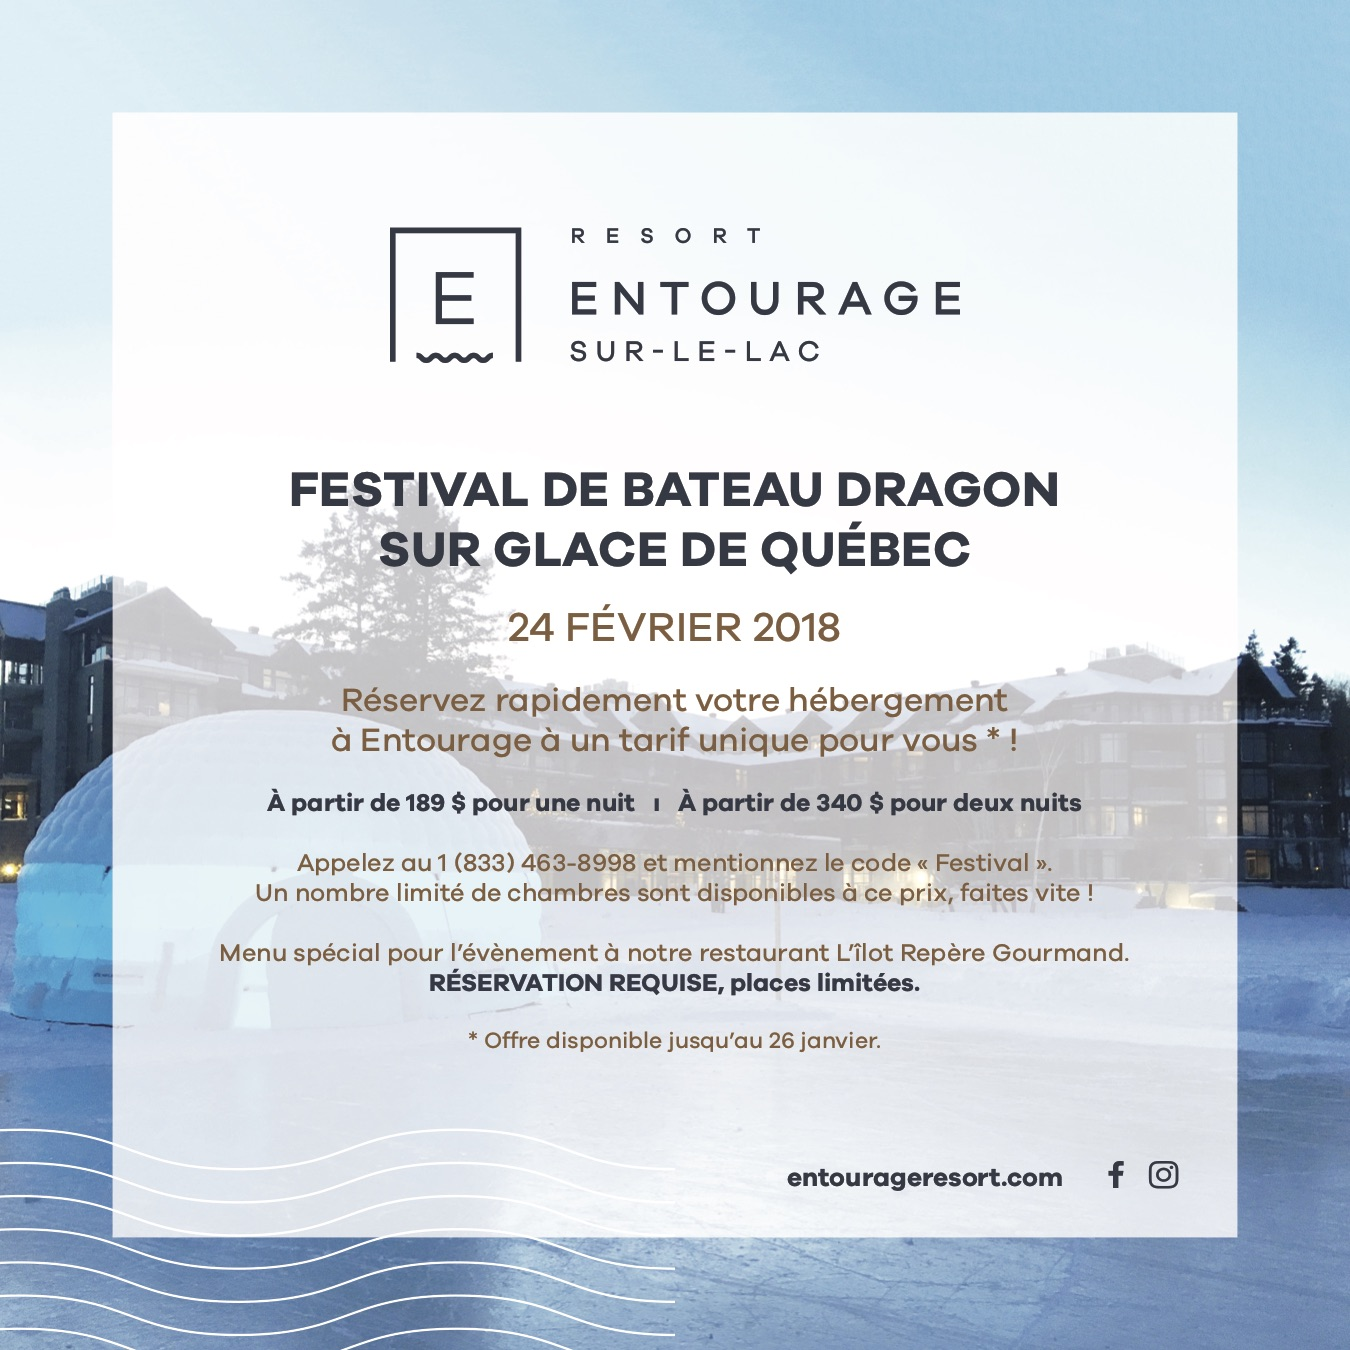 https://www.missiondragonboat.com/wp-content/uploads/2018/01/ESL-Pub-Festival_Bateau_Dragon.jpg